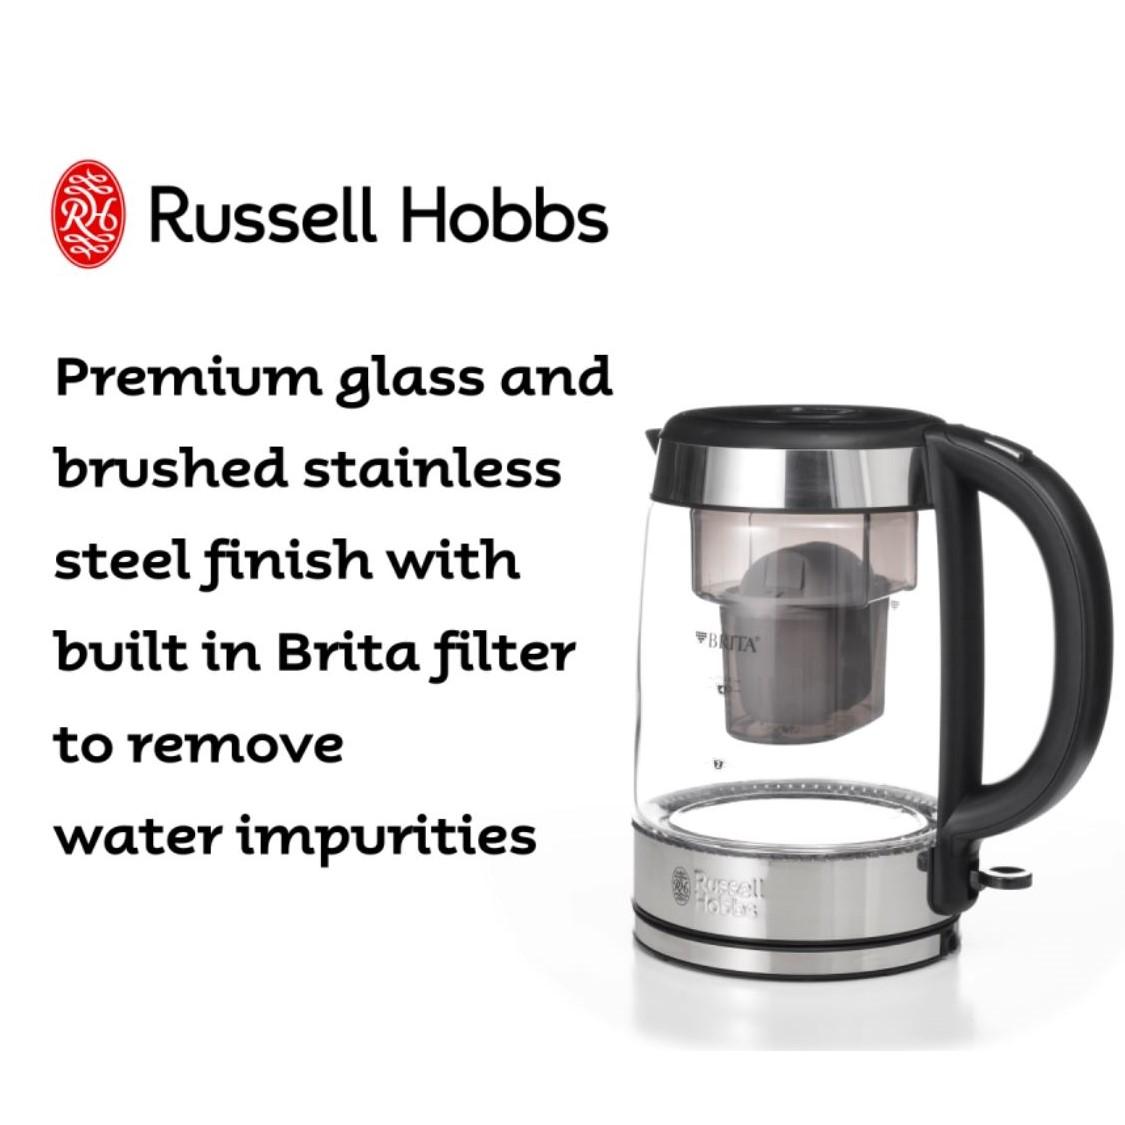 Brita Glass Kettle 360° RHK550 - Russell Hobbs